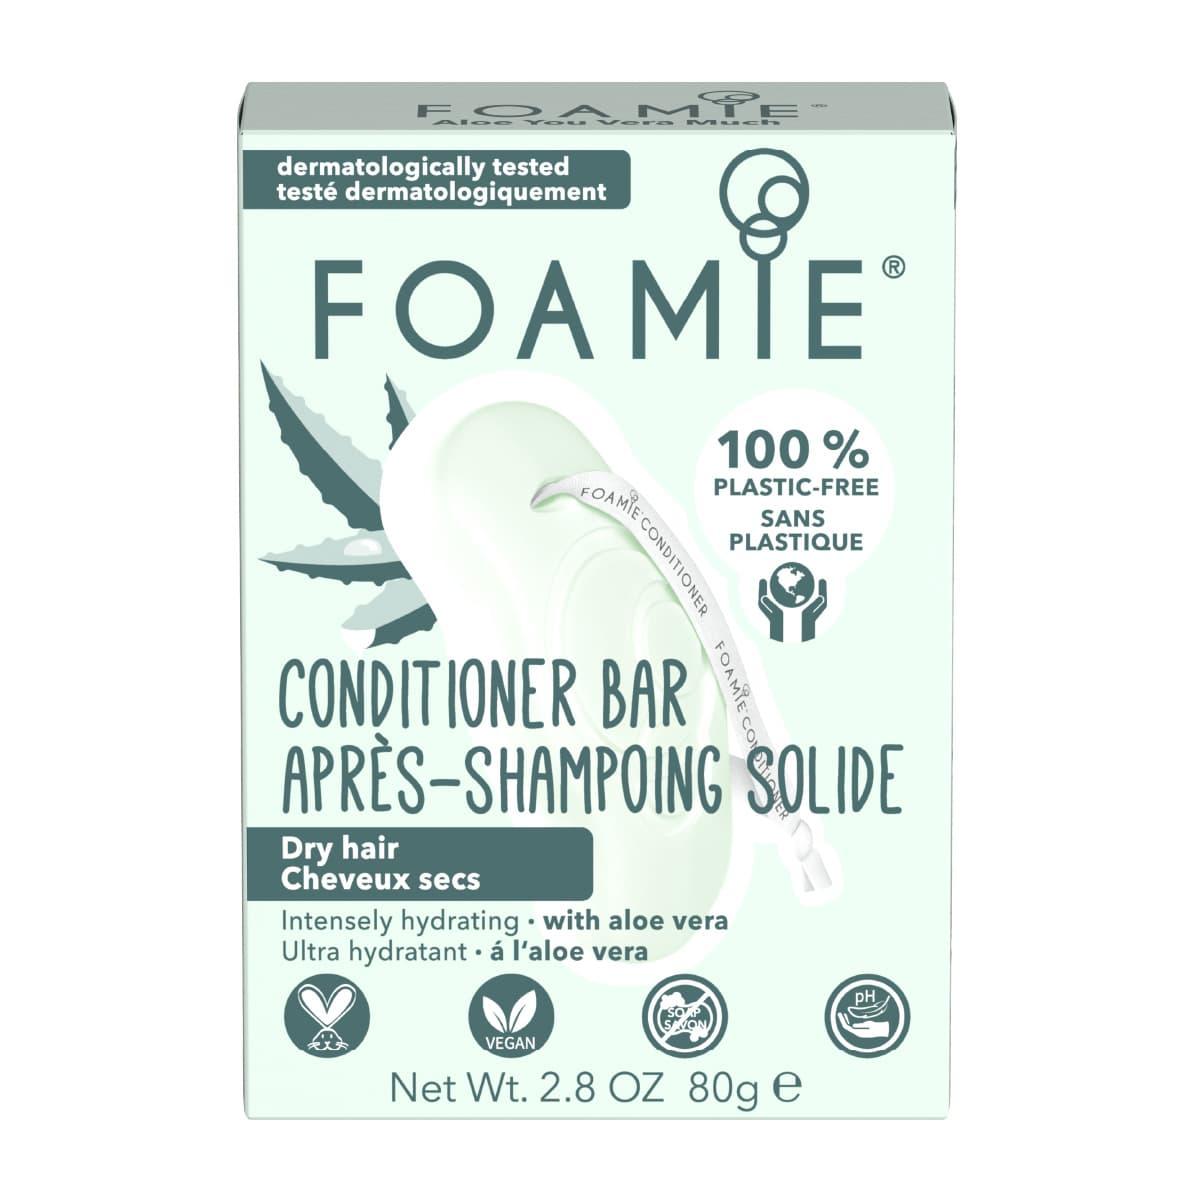 Foamie - Après- Shampoing Aloe You Vera Much